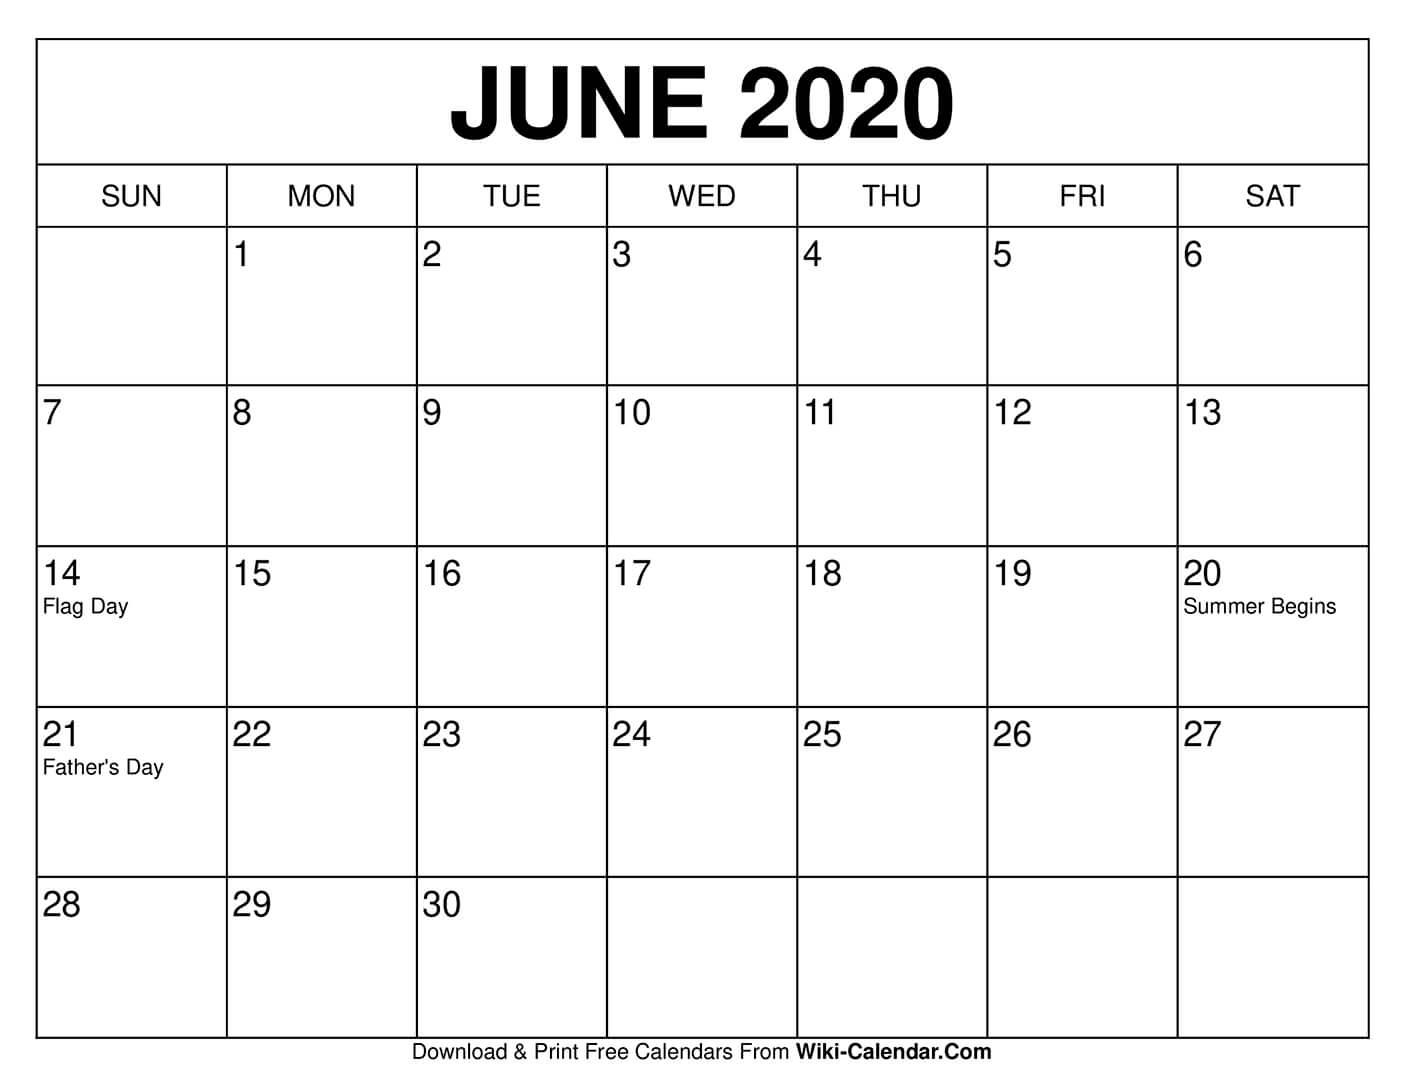 Free Printable June 2020 Calendars with regard to 8.5 X 11 Free Printable Monthly Calendar 2020